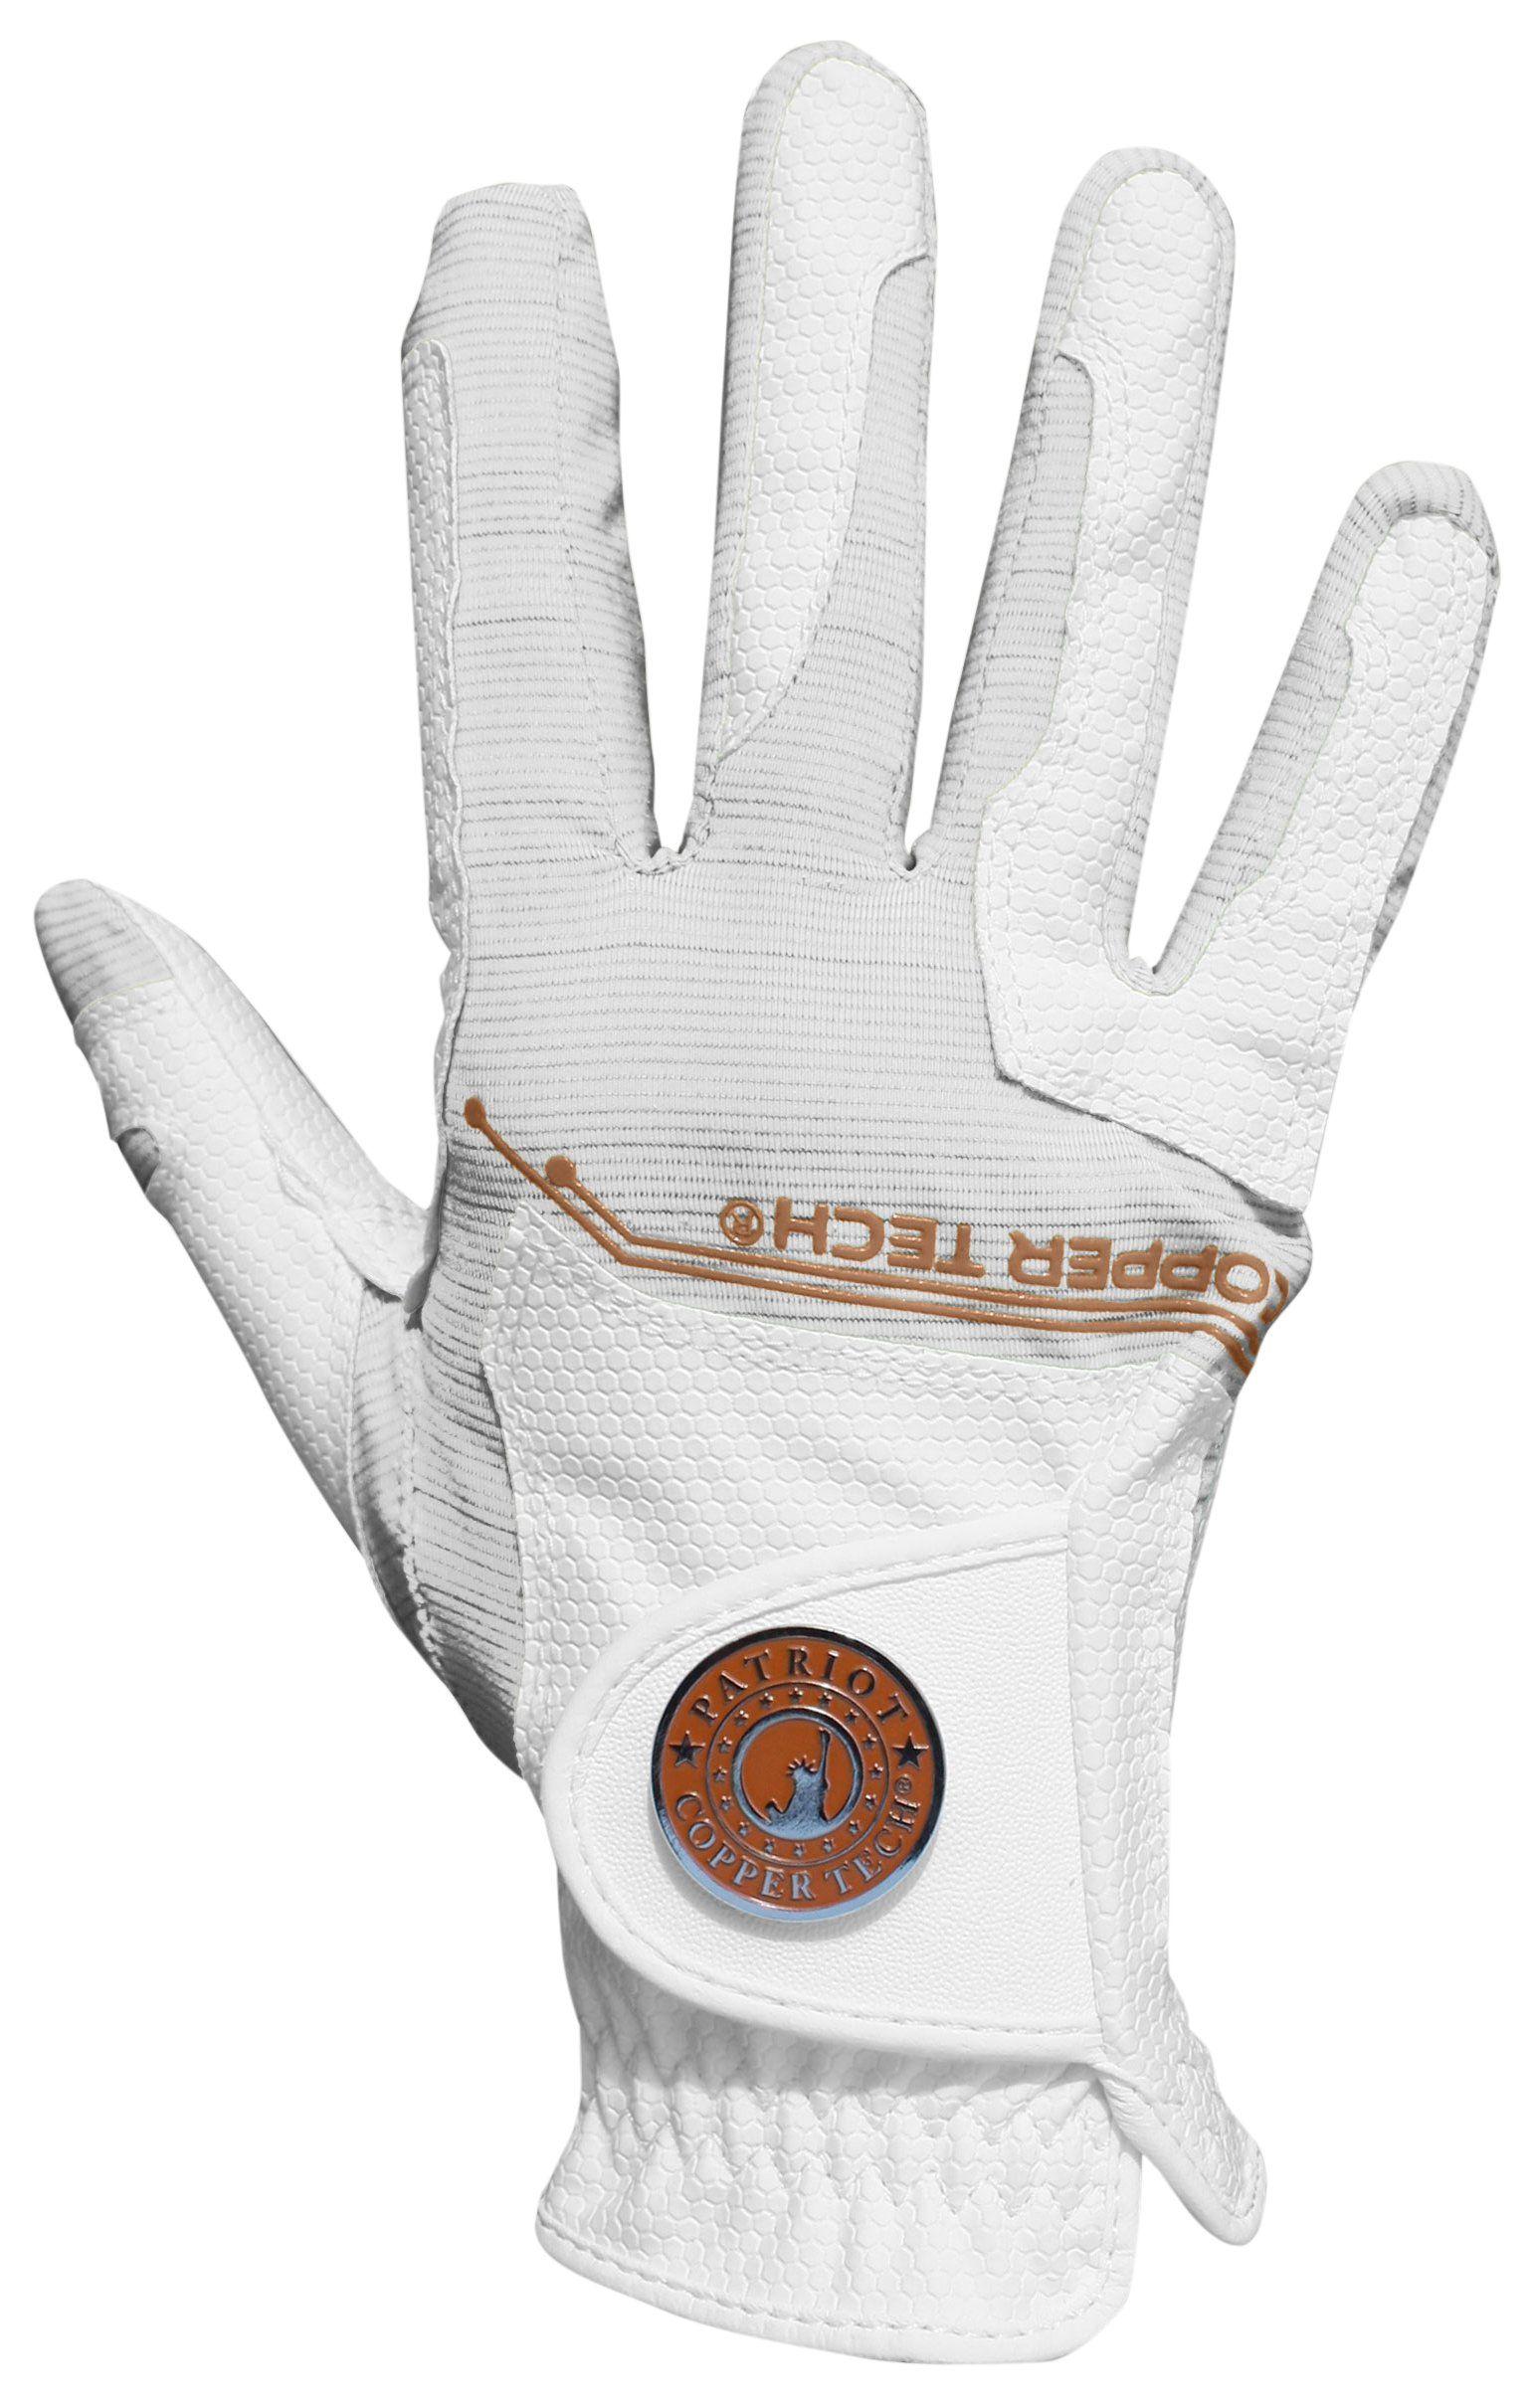 Golf glove copper tech gloves womens golf glove white